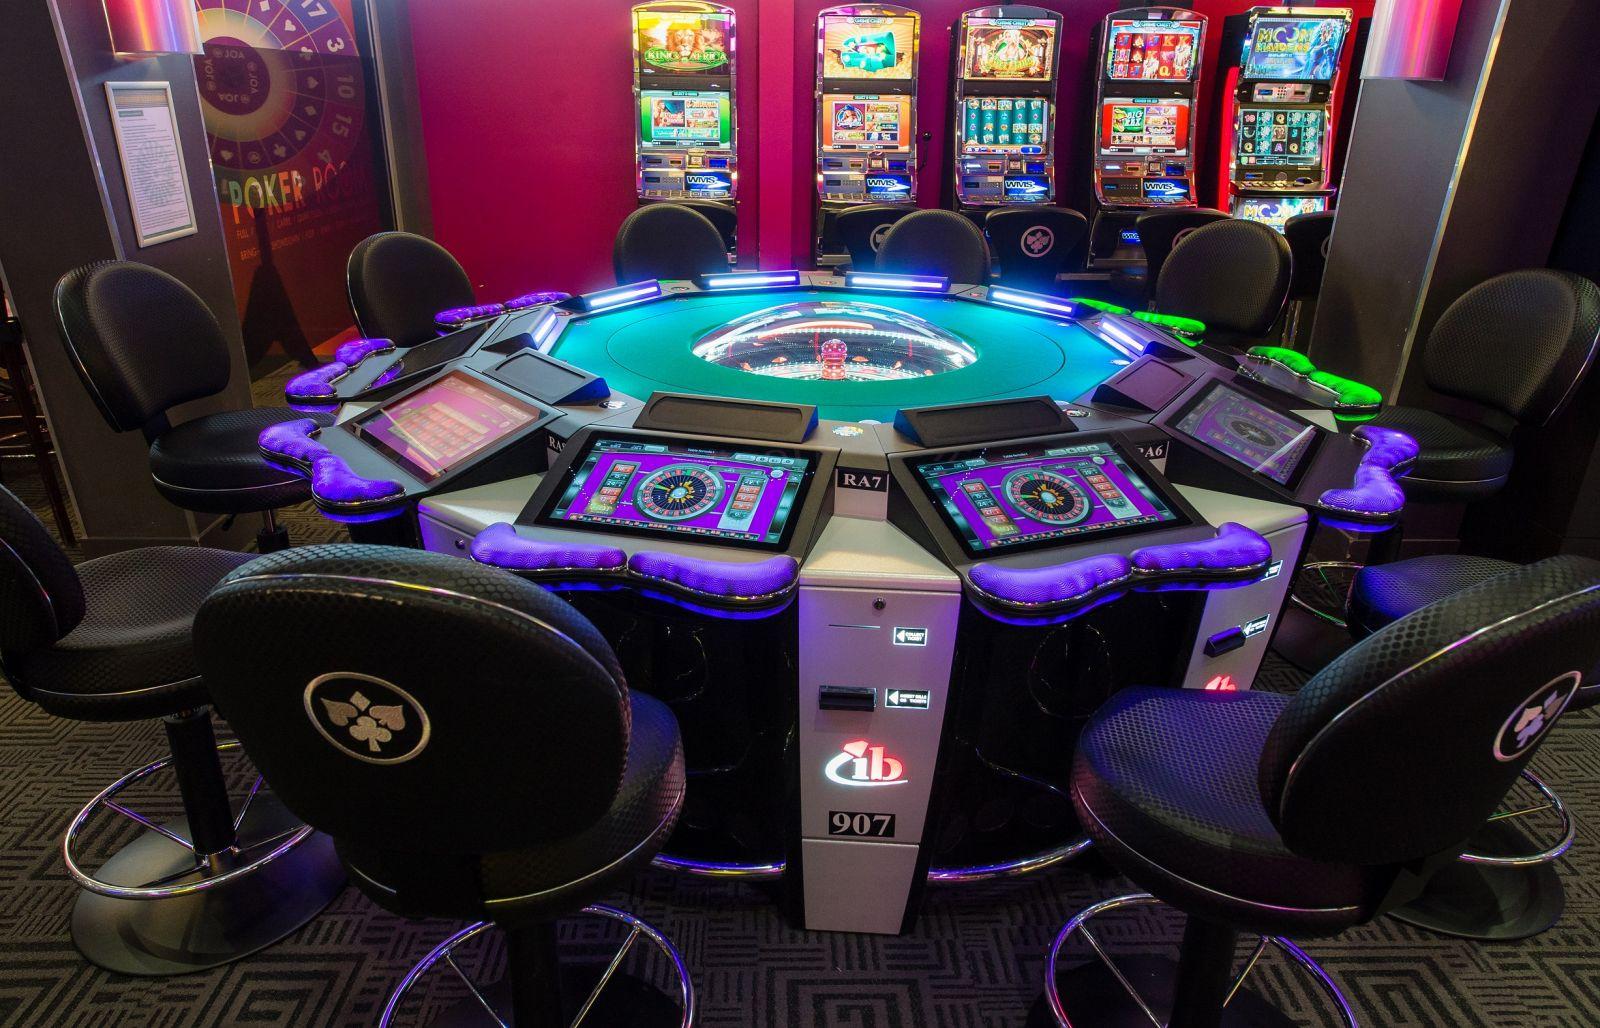 Jackpot wheel 900 free spins